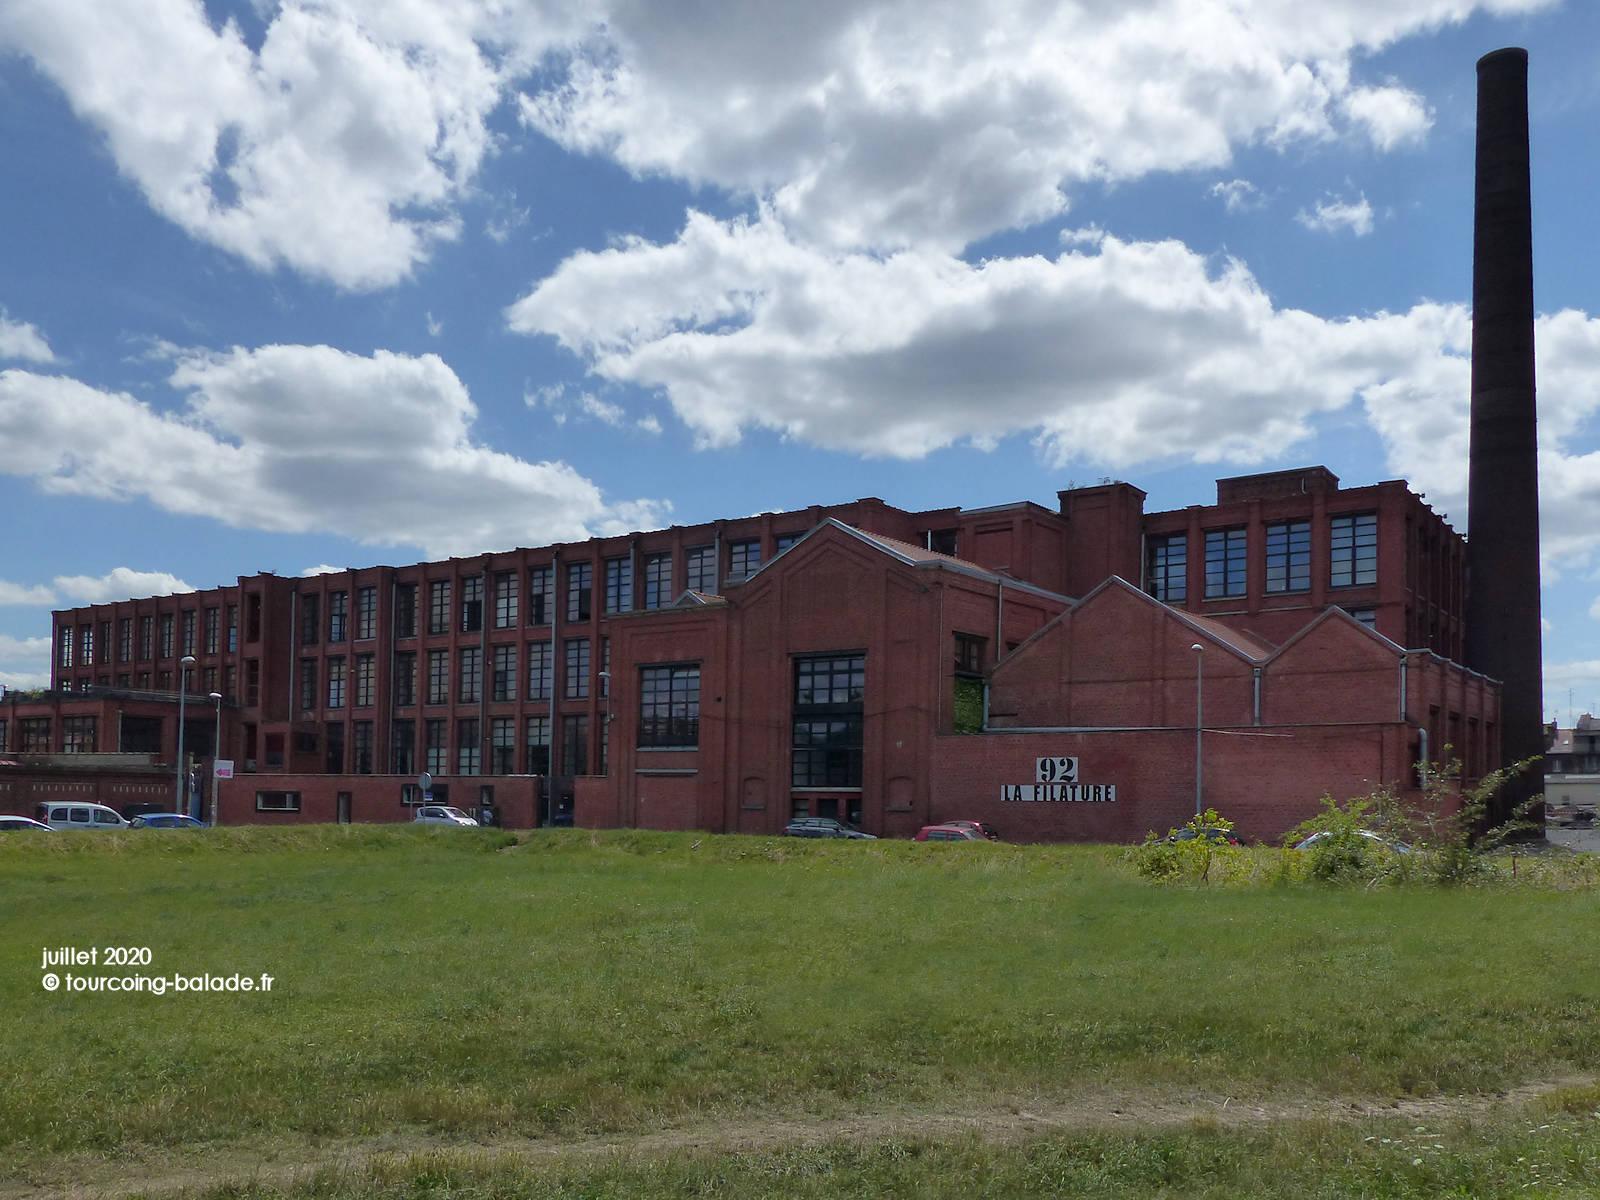 Lofts 92 La Filature, Tourcoing 2020